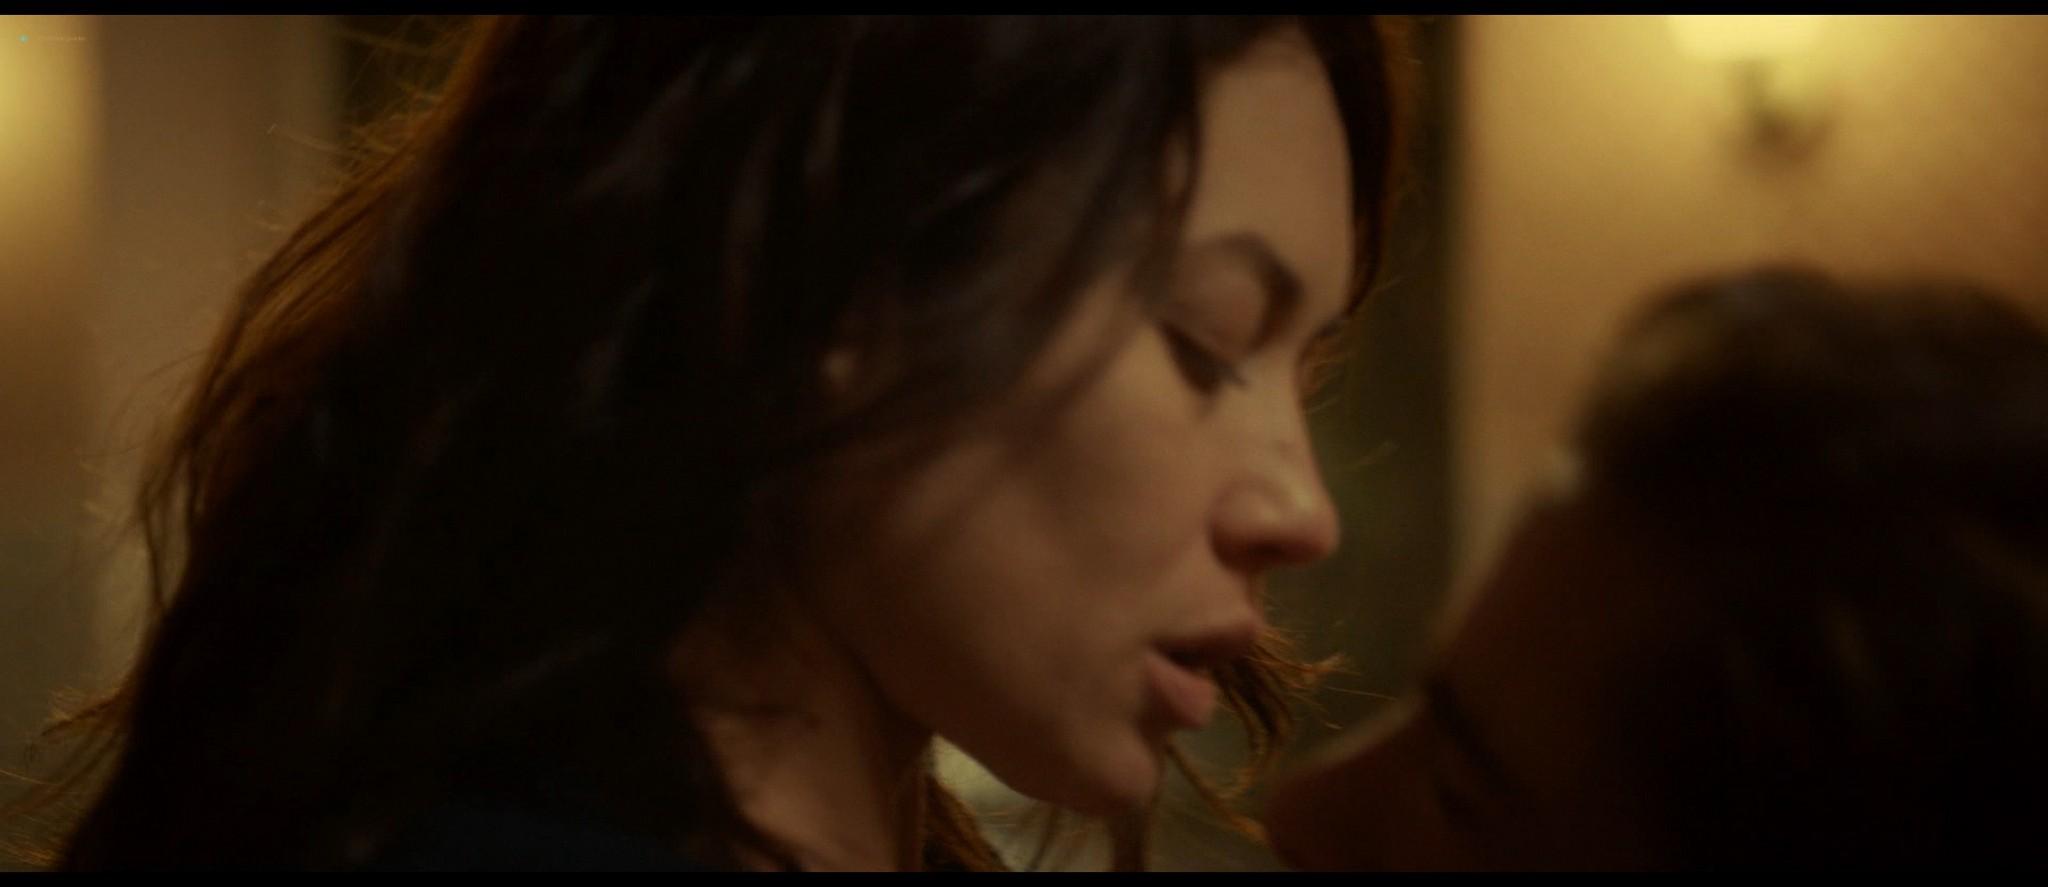 Olga Kurylenko hot and sexy in The Room (2019) HD 1080p BluRay (3)